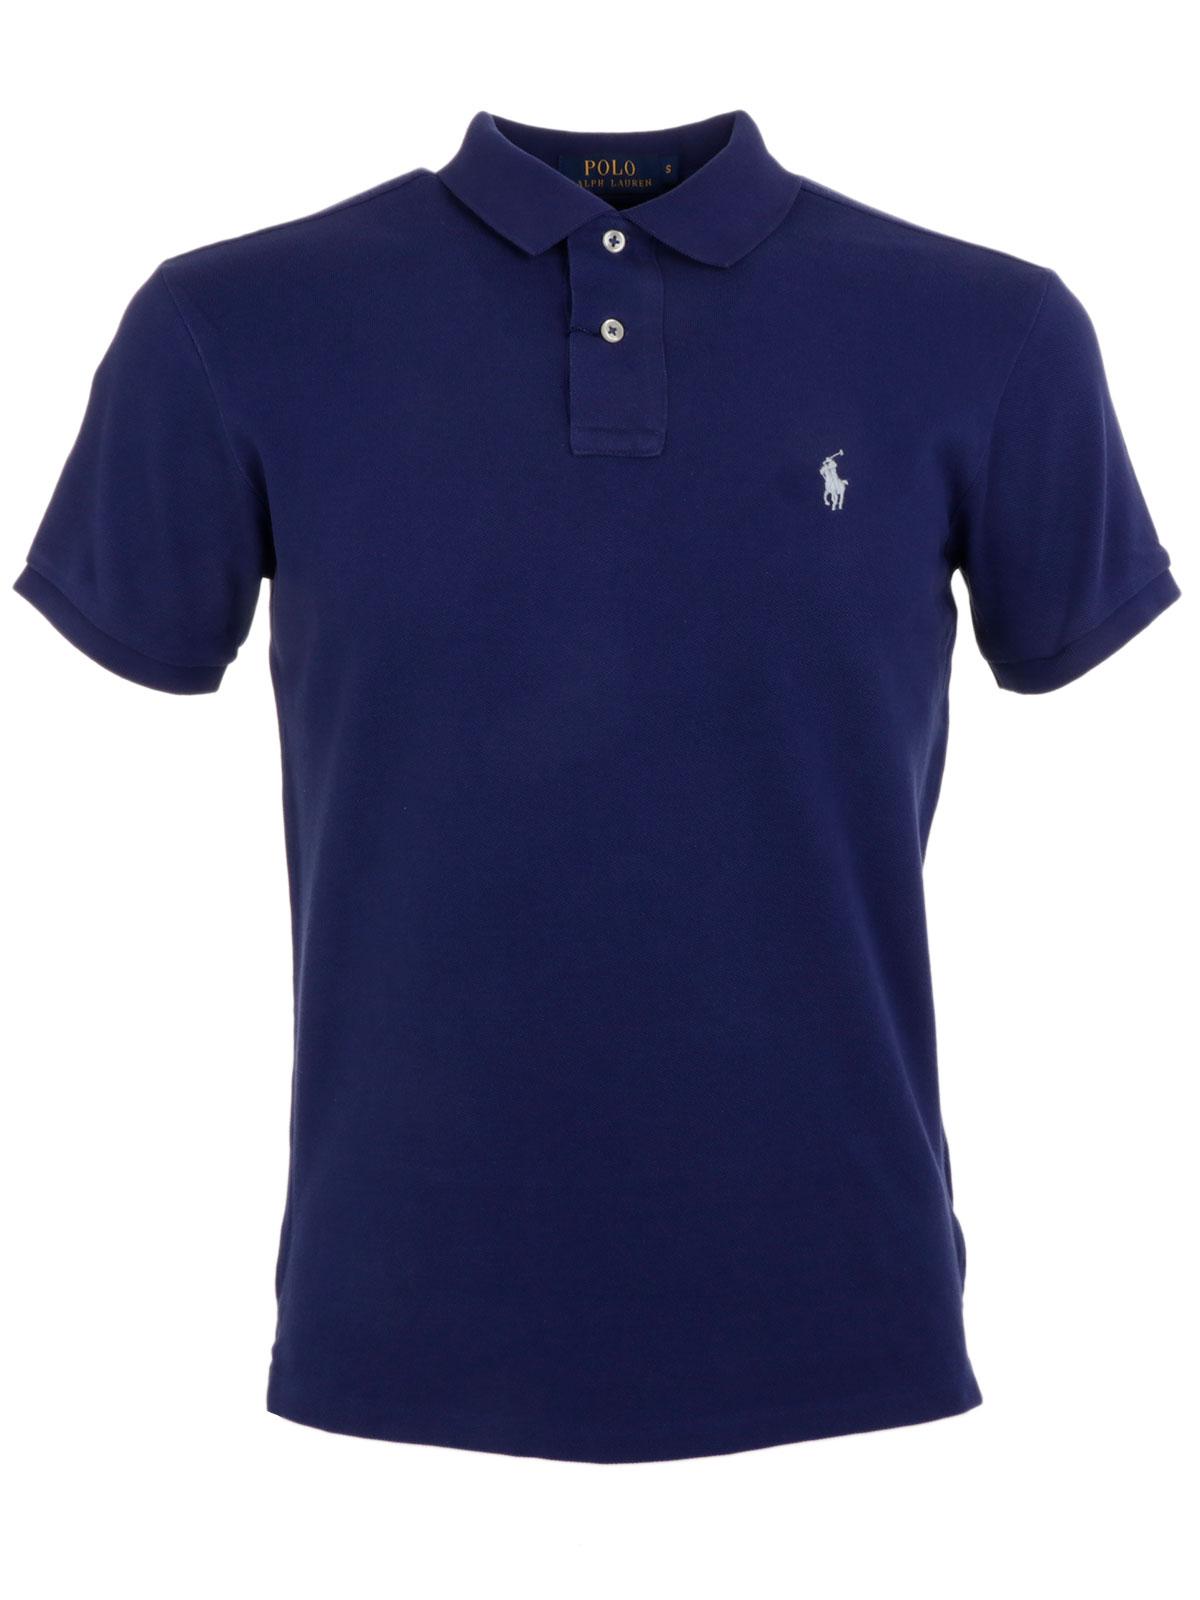 Polo ralph lauren men 39 s custom fit polo shirt xw7m3 for Polo ralph lauren custom fit polo shirt